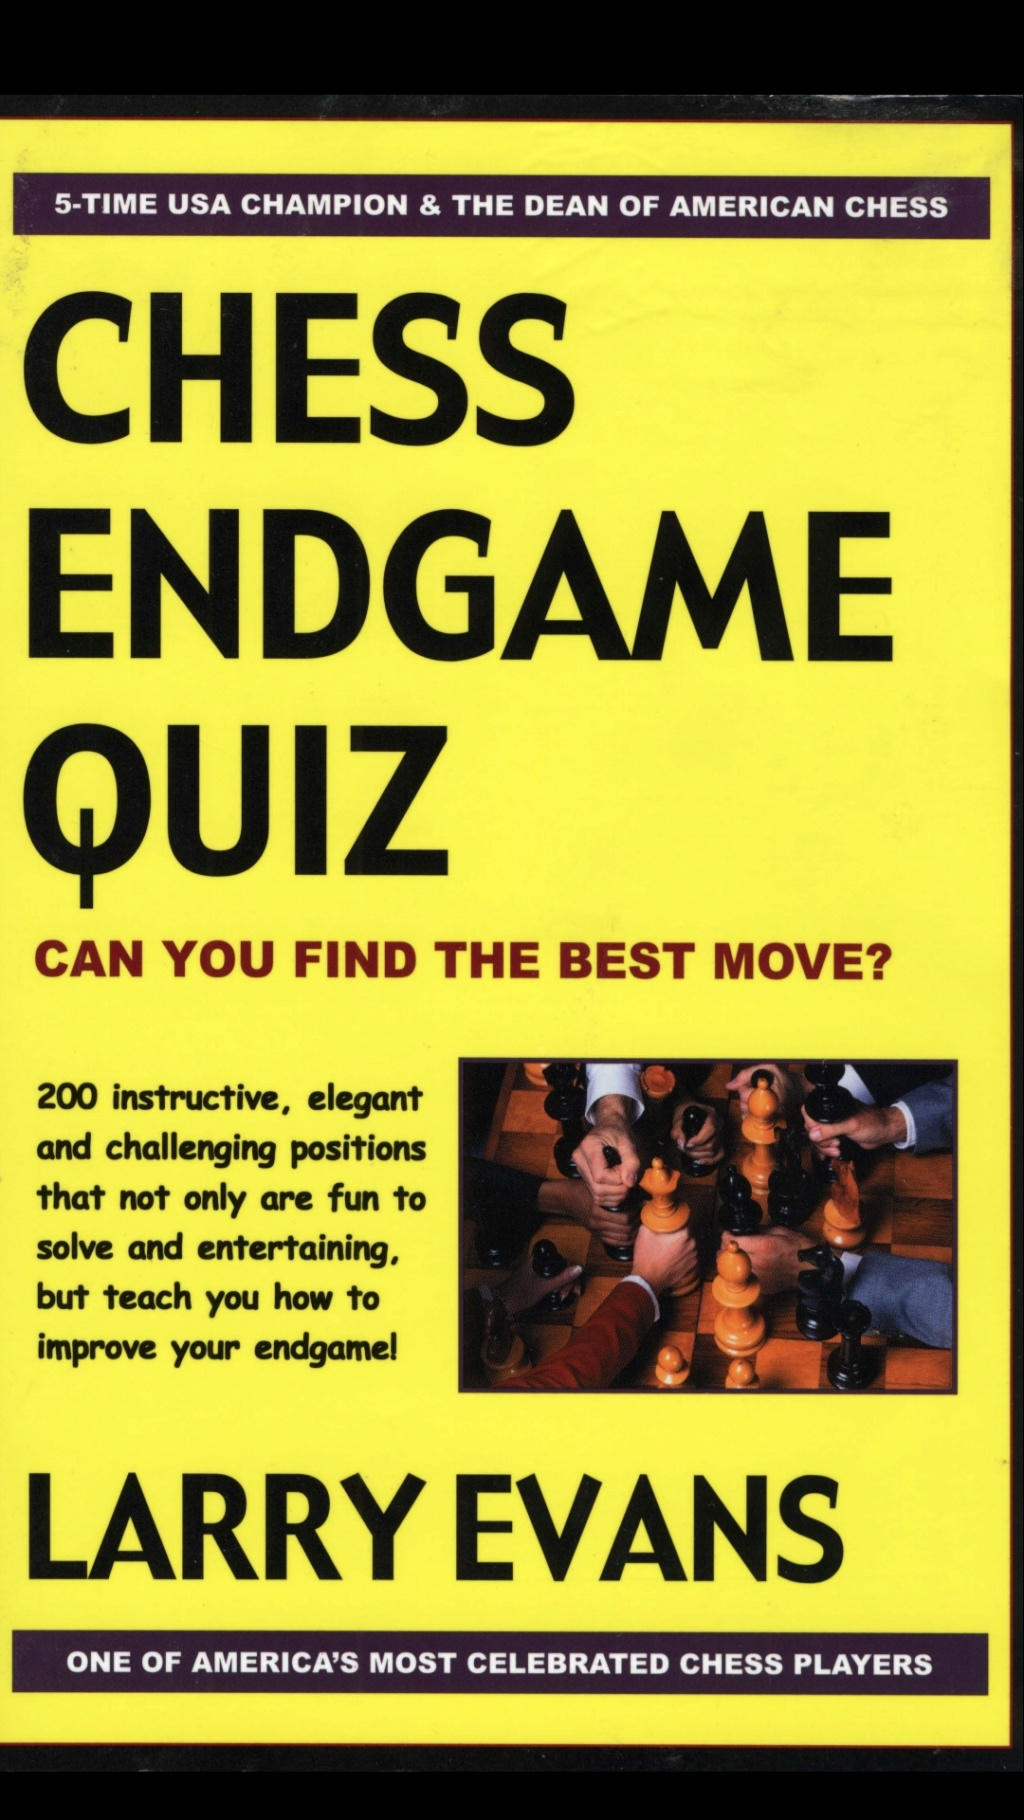 Larry Evans_Chess Endgame Quiz Screen32